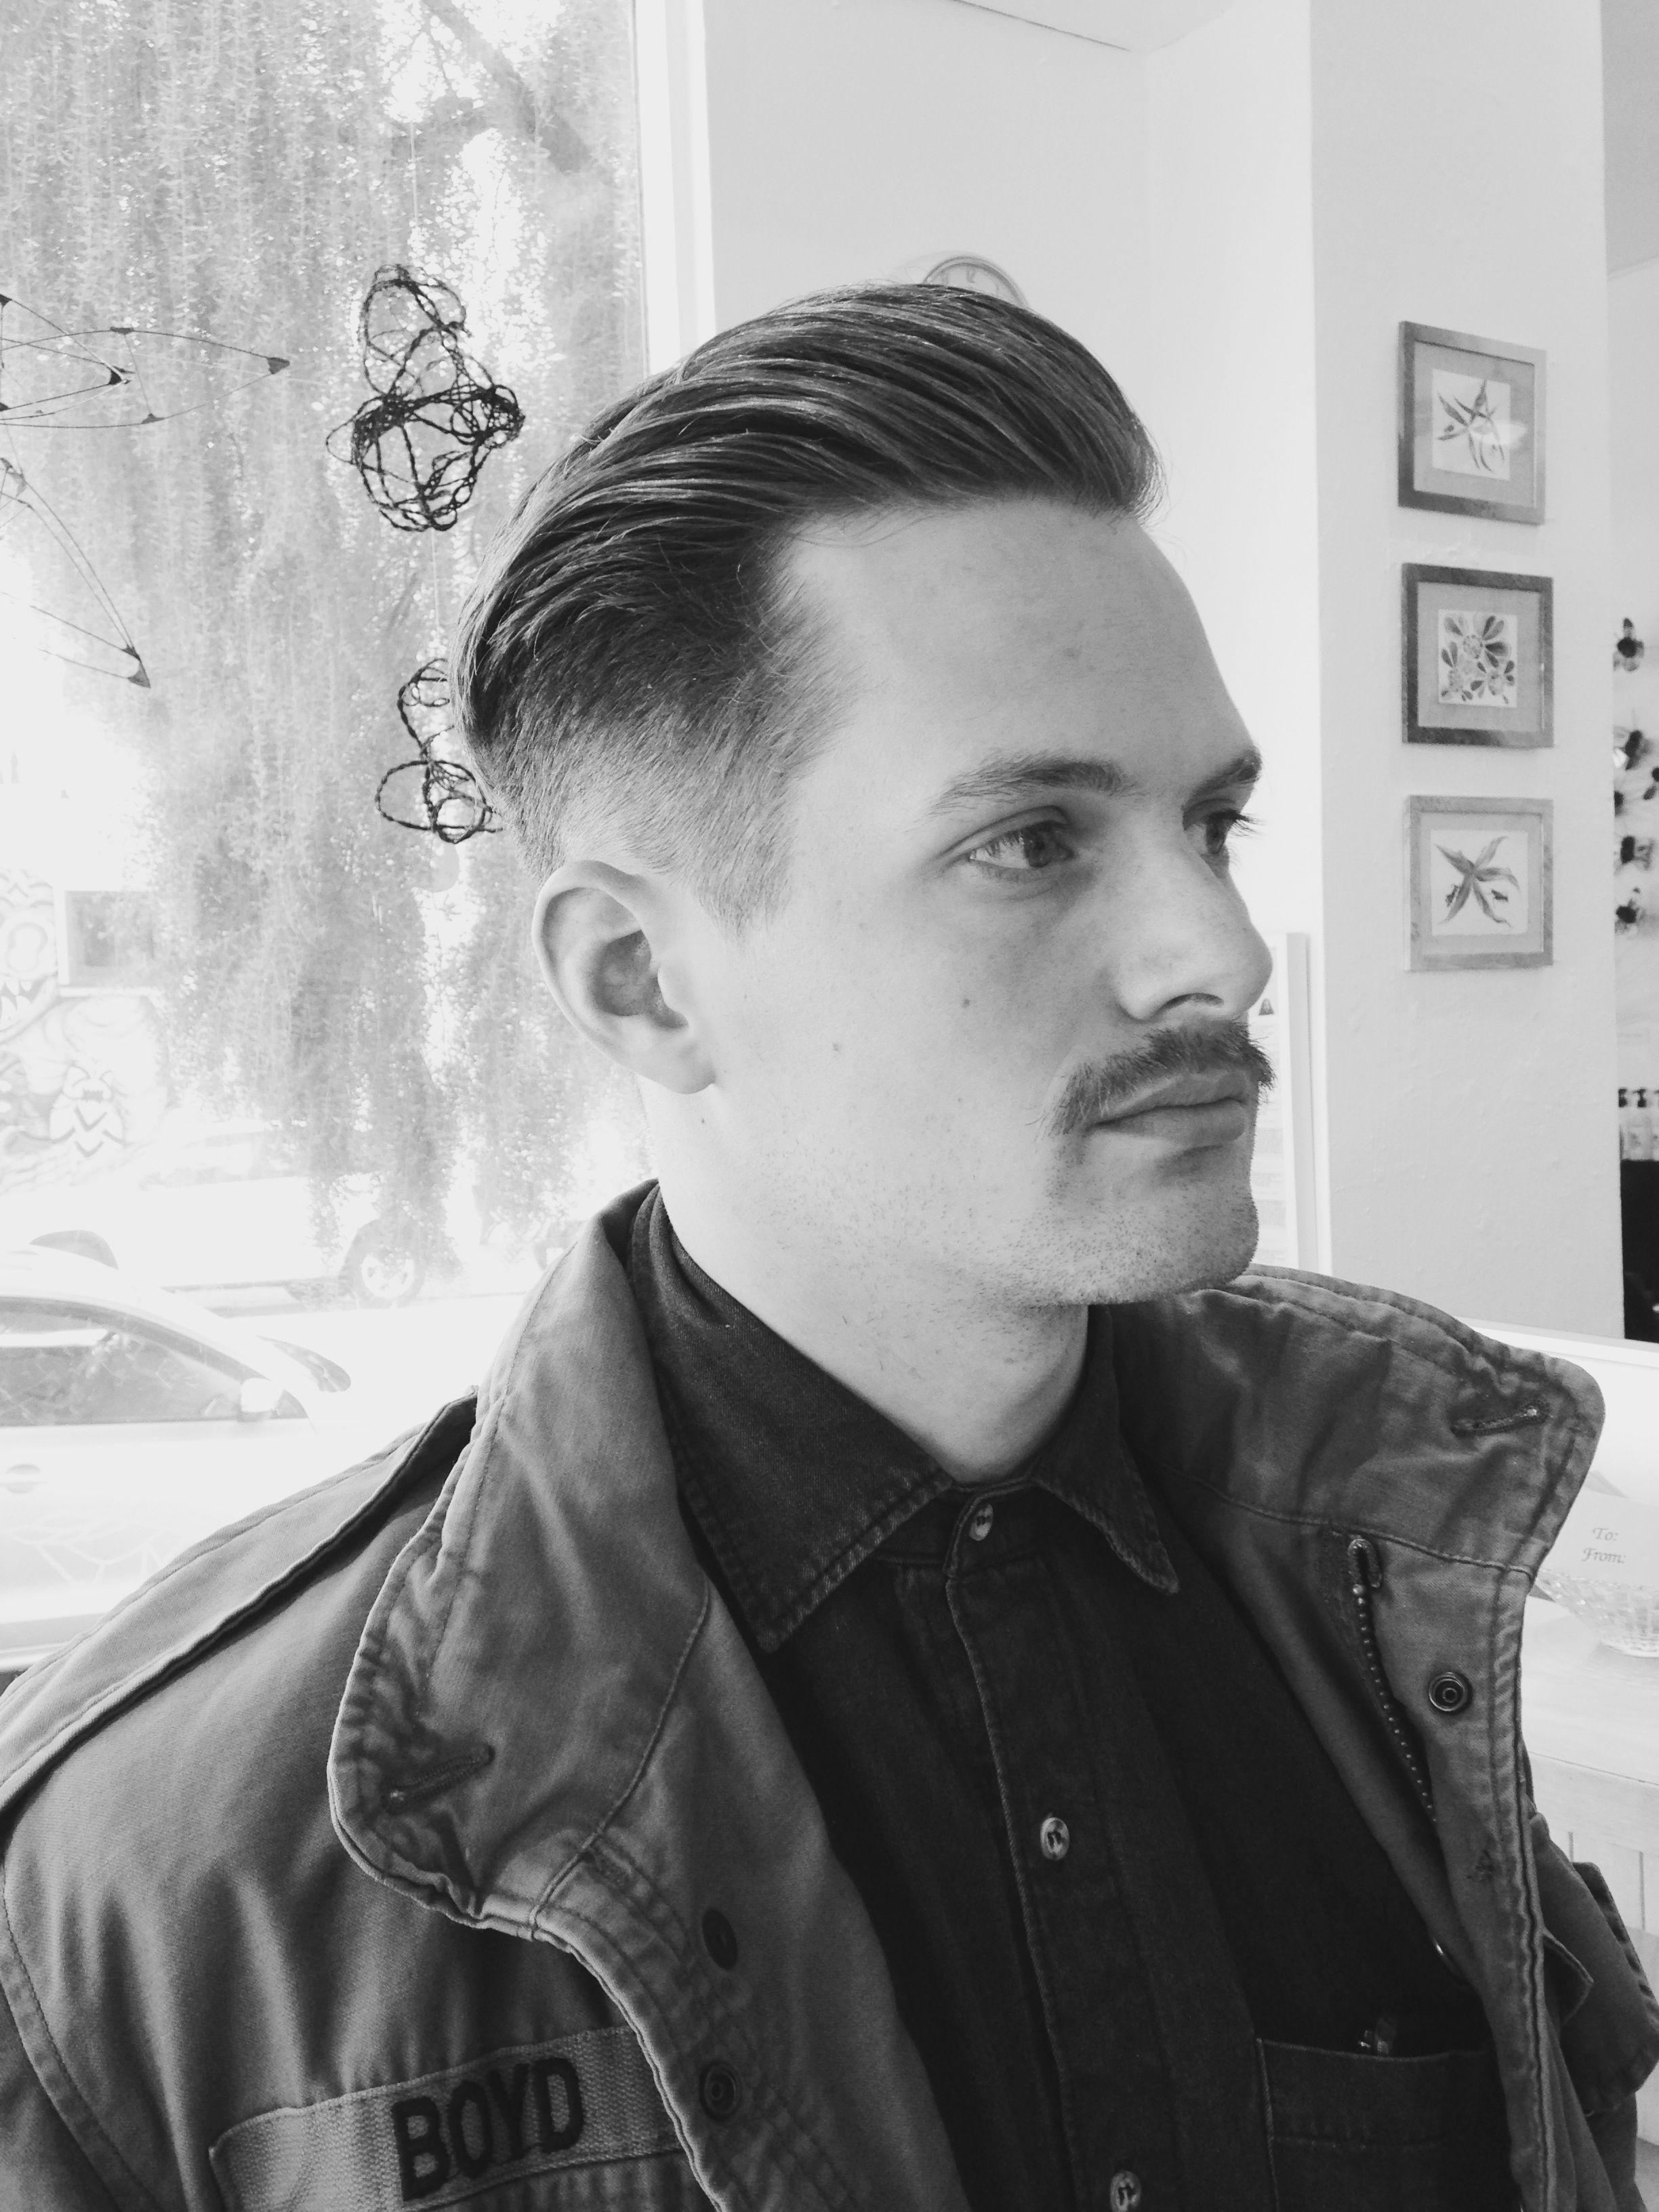 Dapper Mens Haircut By Seana Edo Salon Estilismo Xy Pinterest